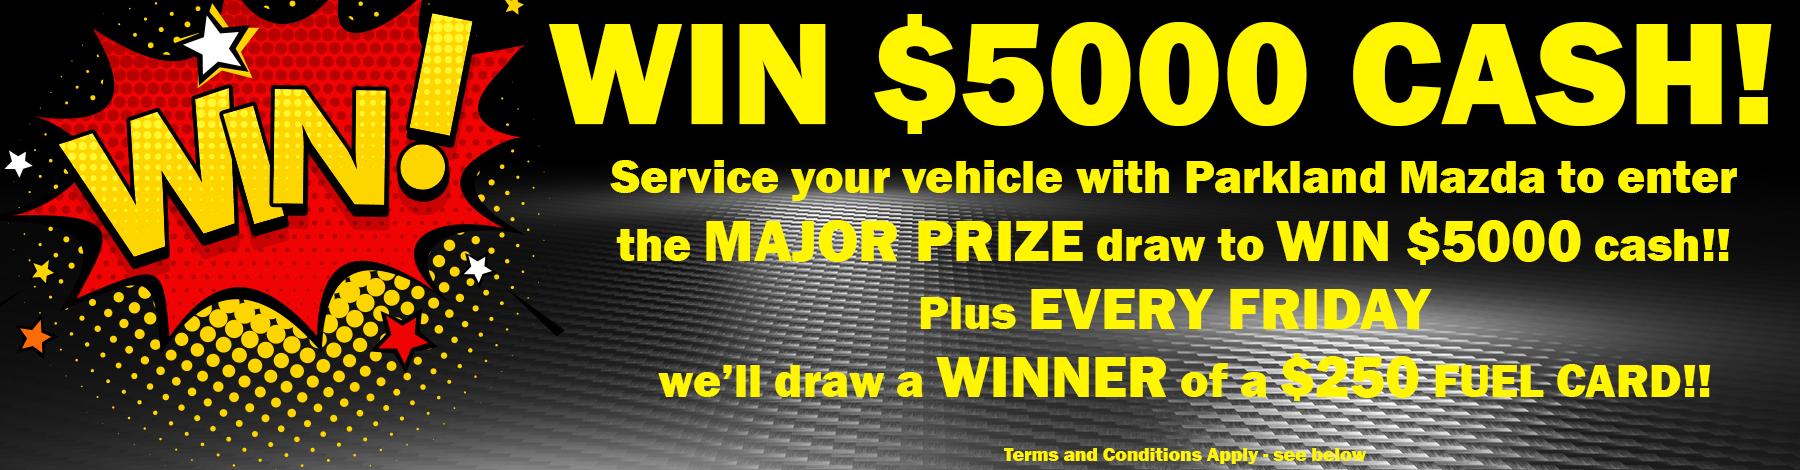 Service to Win at Parkland Mazda